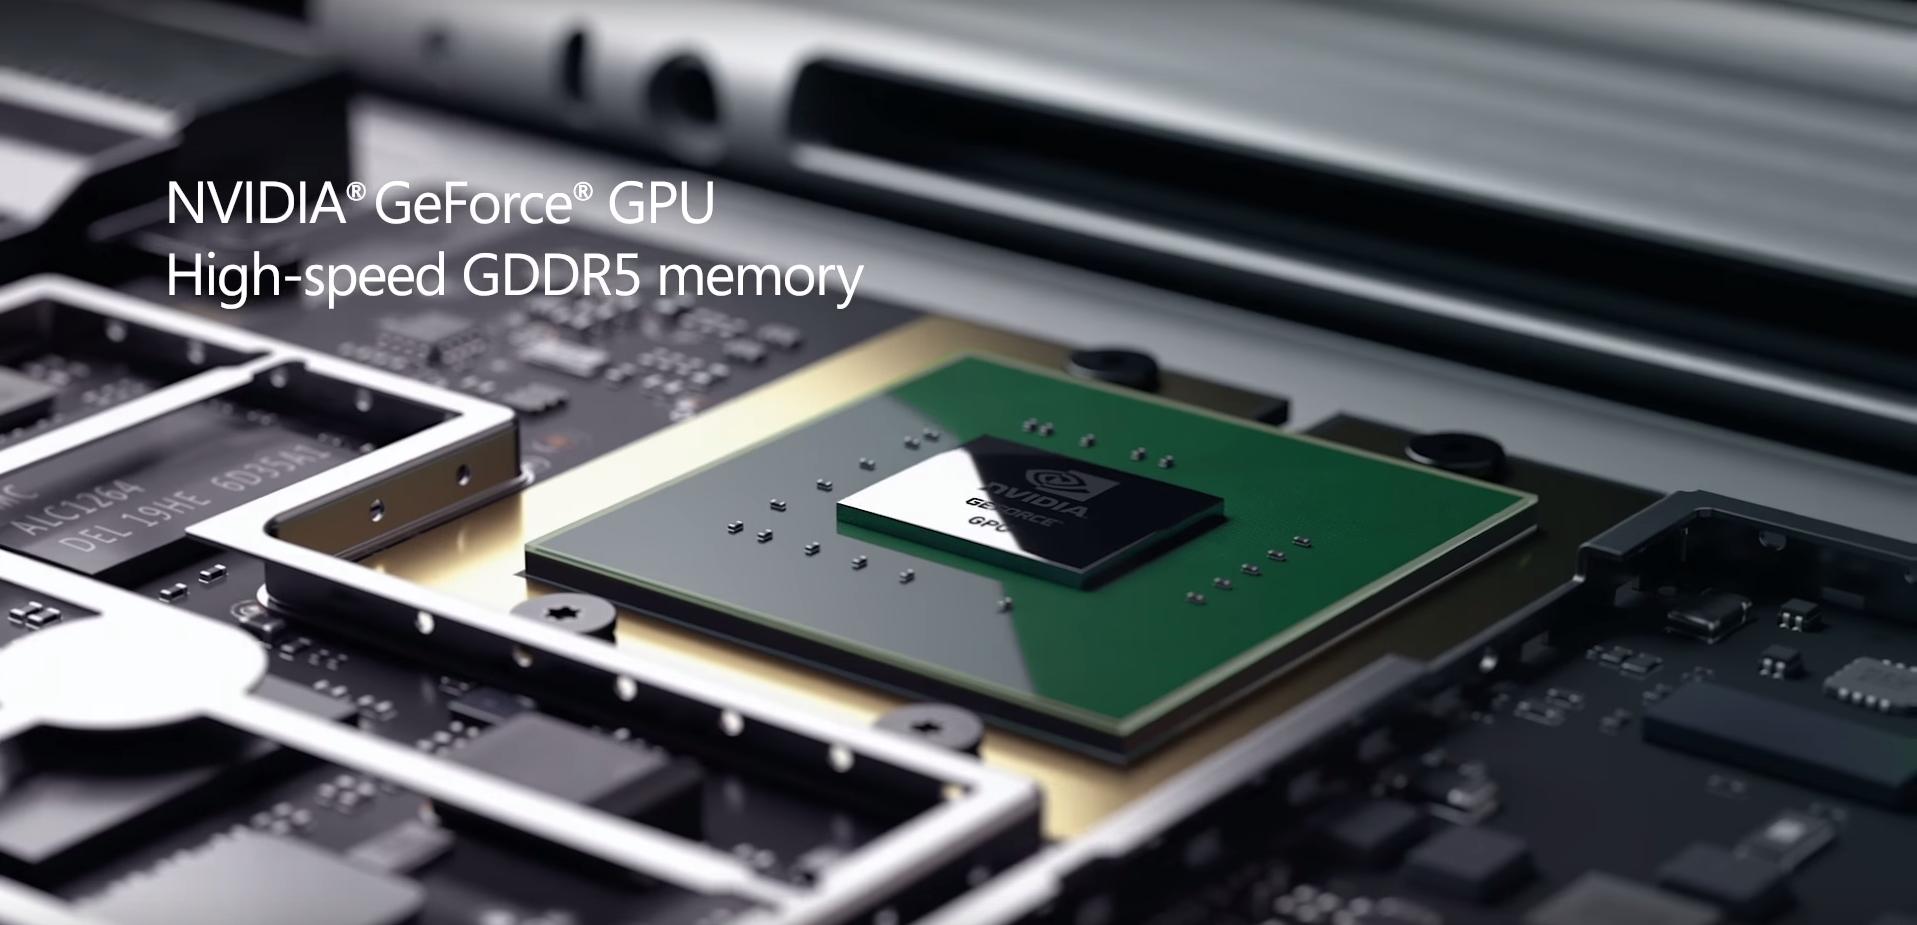 Surface Book integra gráficos Nvidia GeForce GDDR5